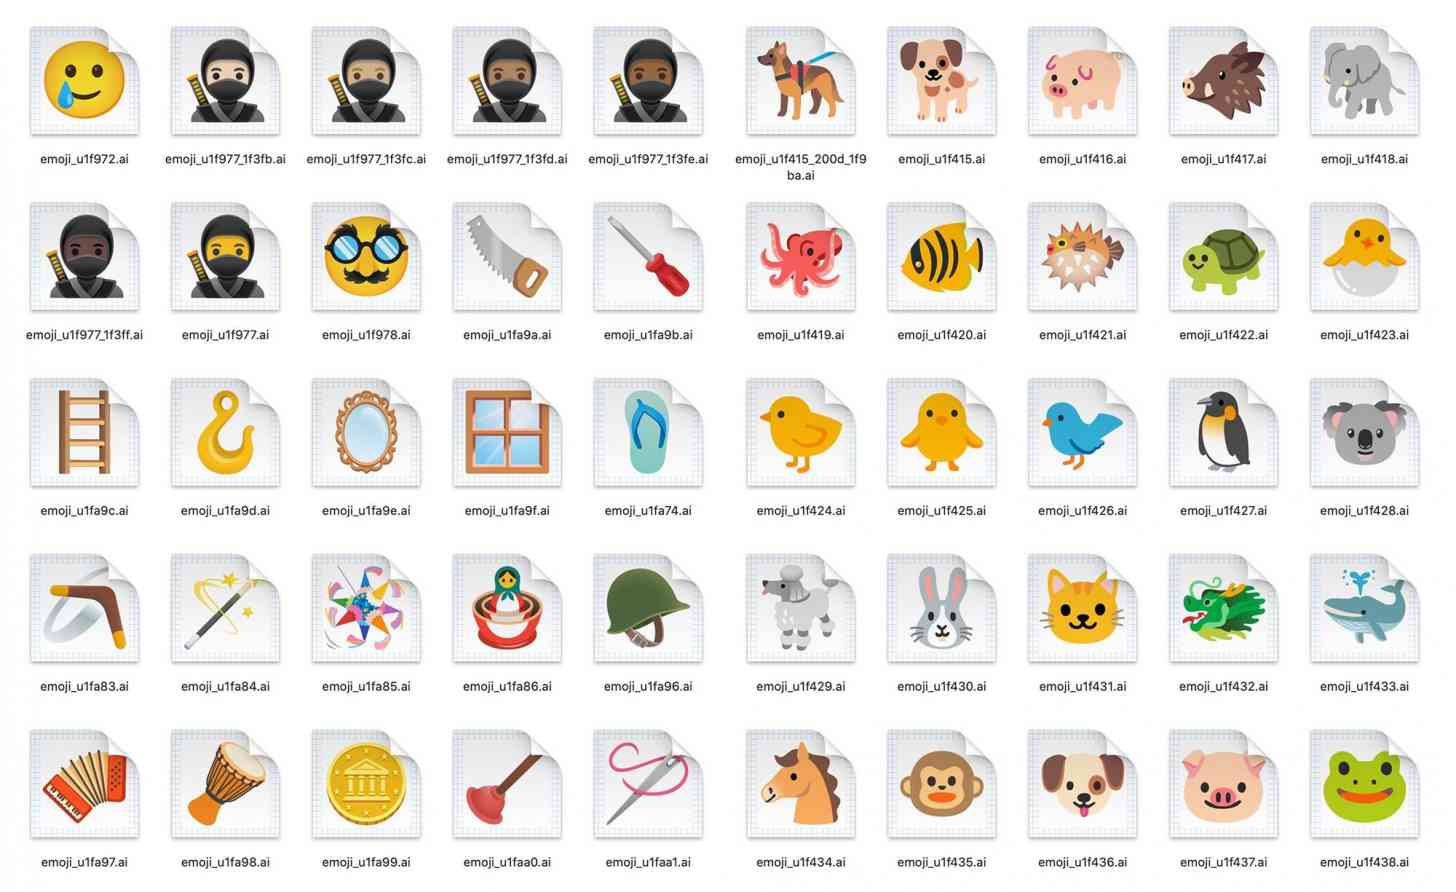 Android 11 new emoji